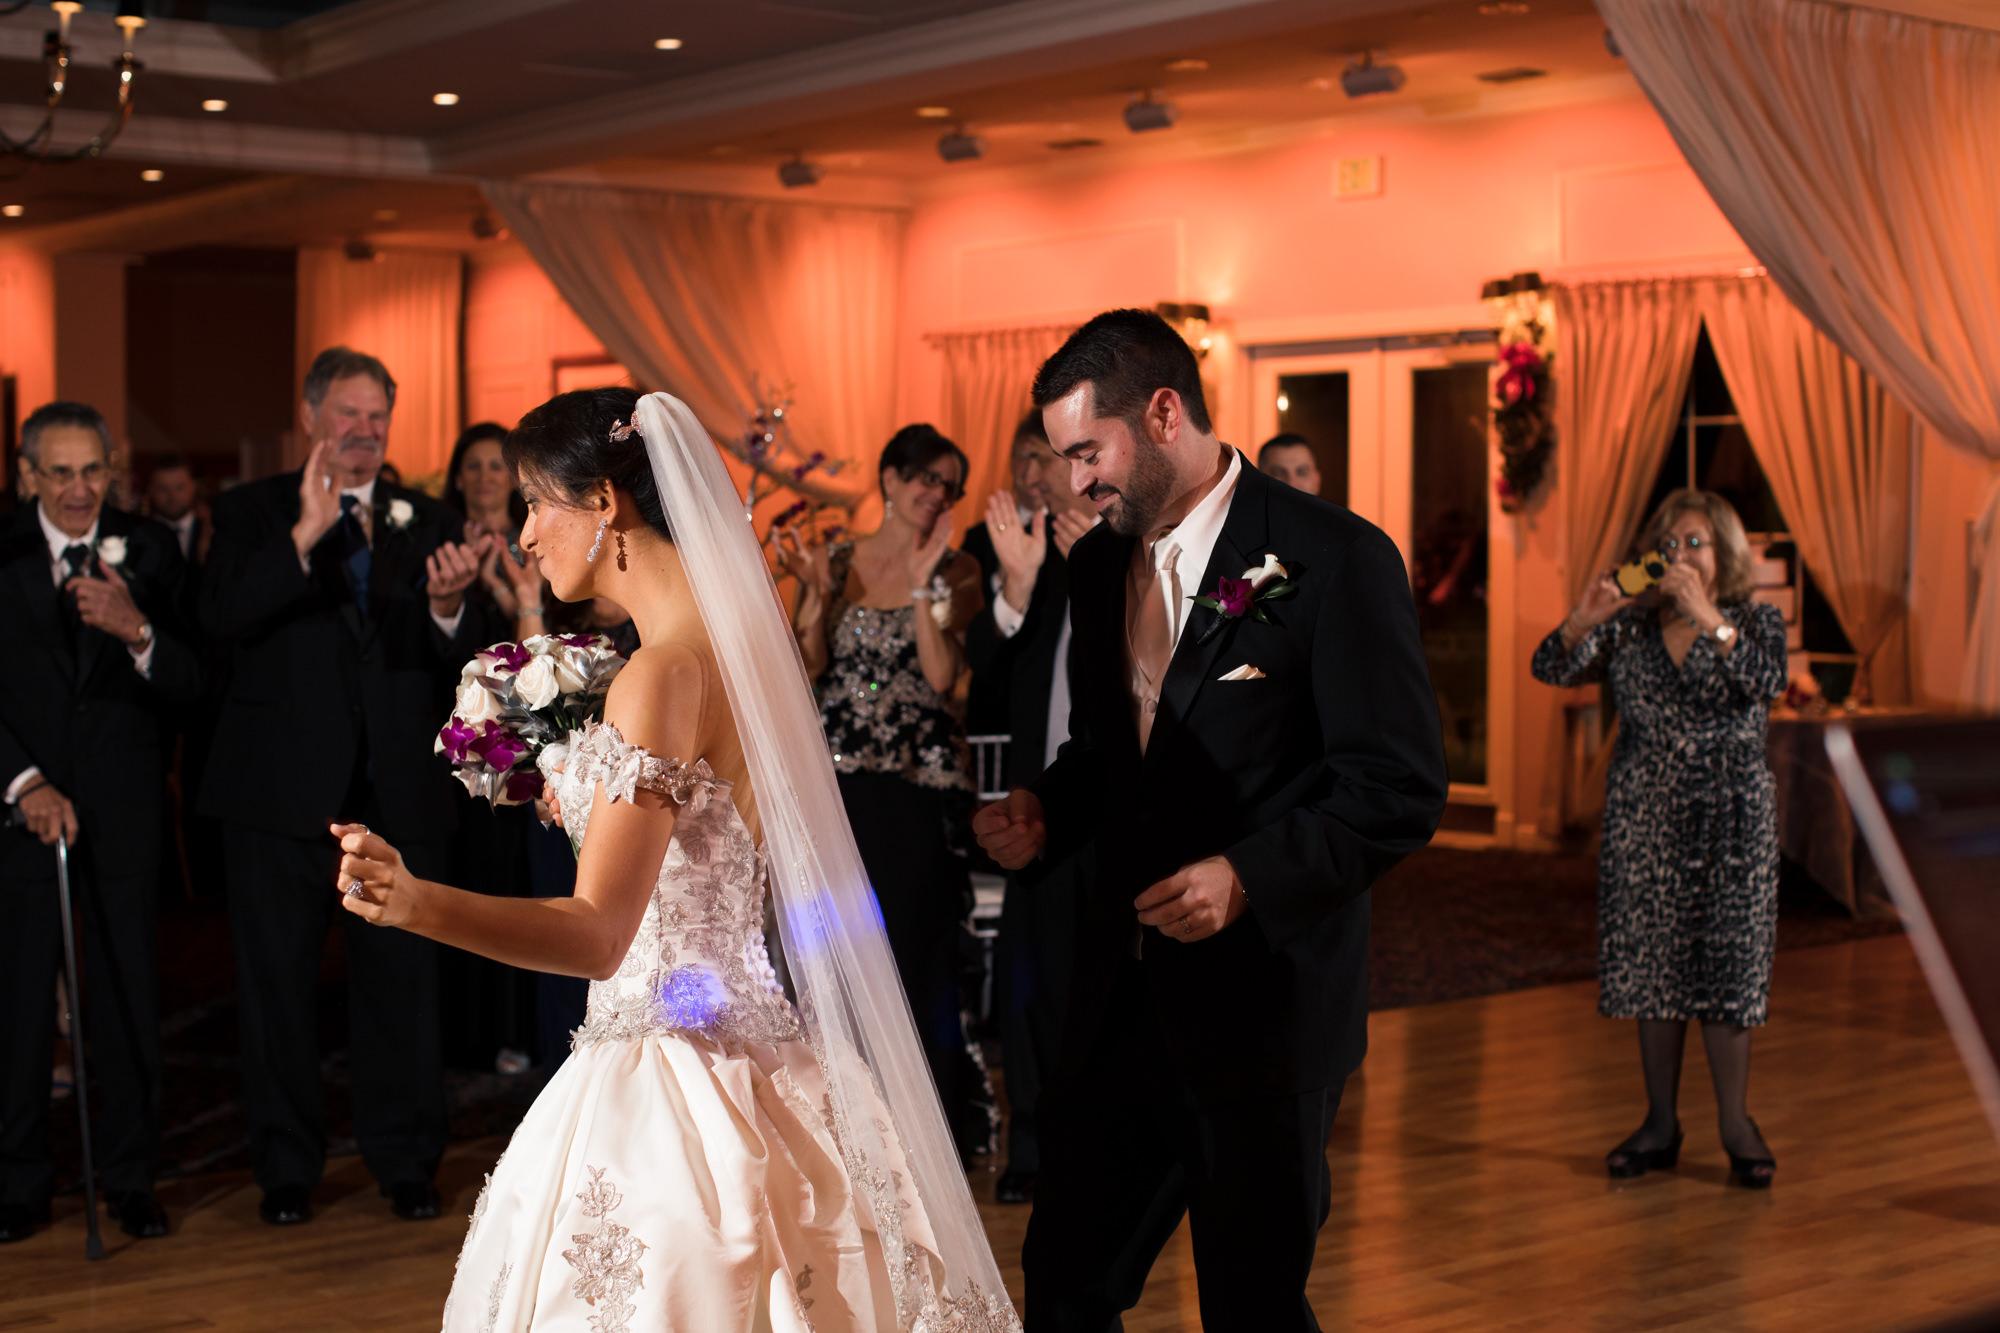 Benvenuto_Wedding_catholic_Florida_Bride-Groom-105.jpg